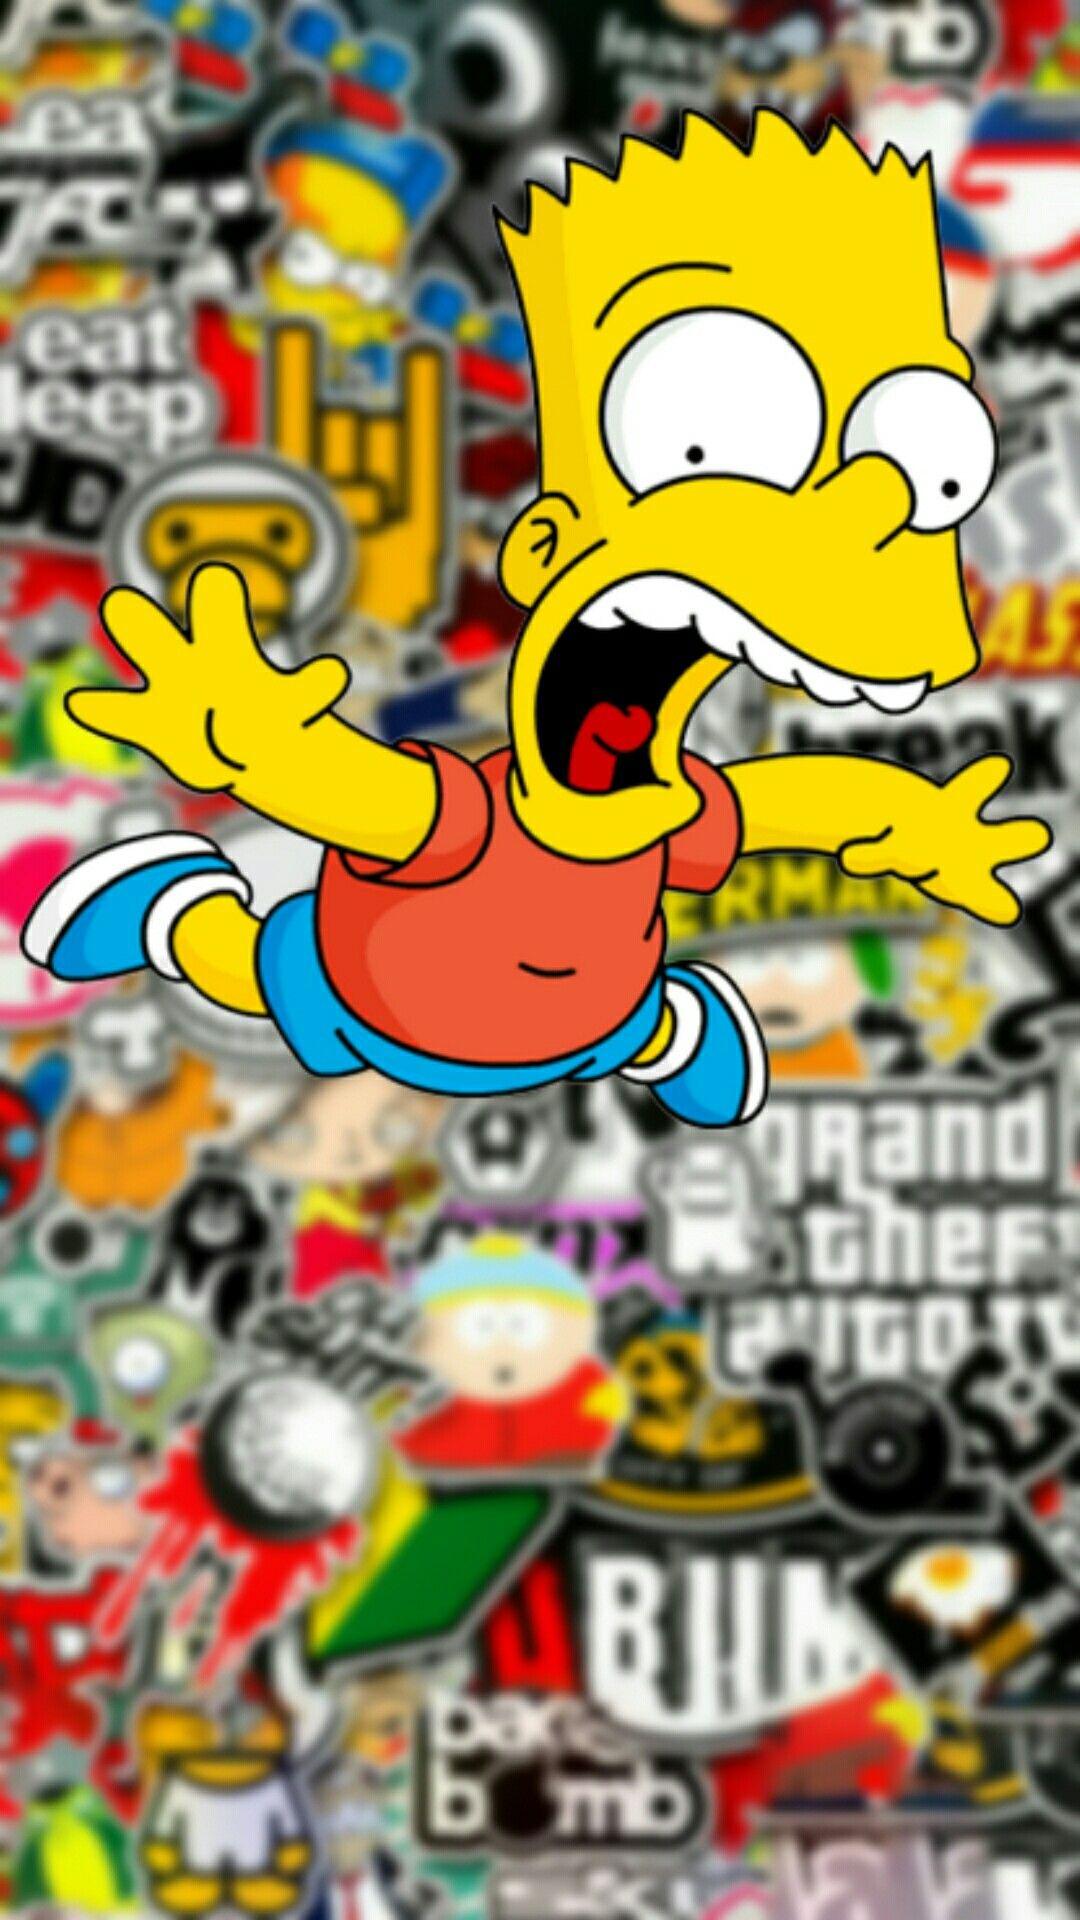 Bart Simpson Supreme Iphone Wallpaper Kadada Org